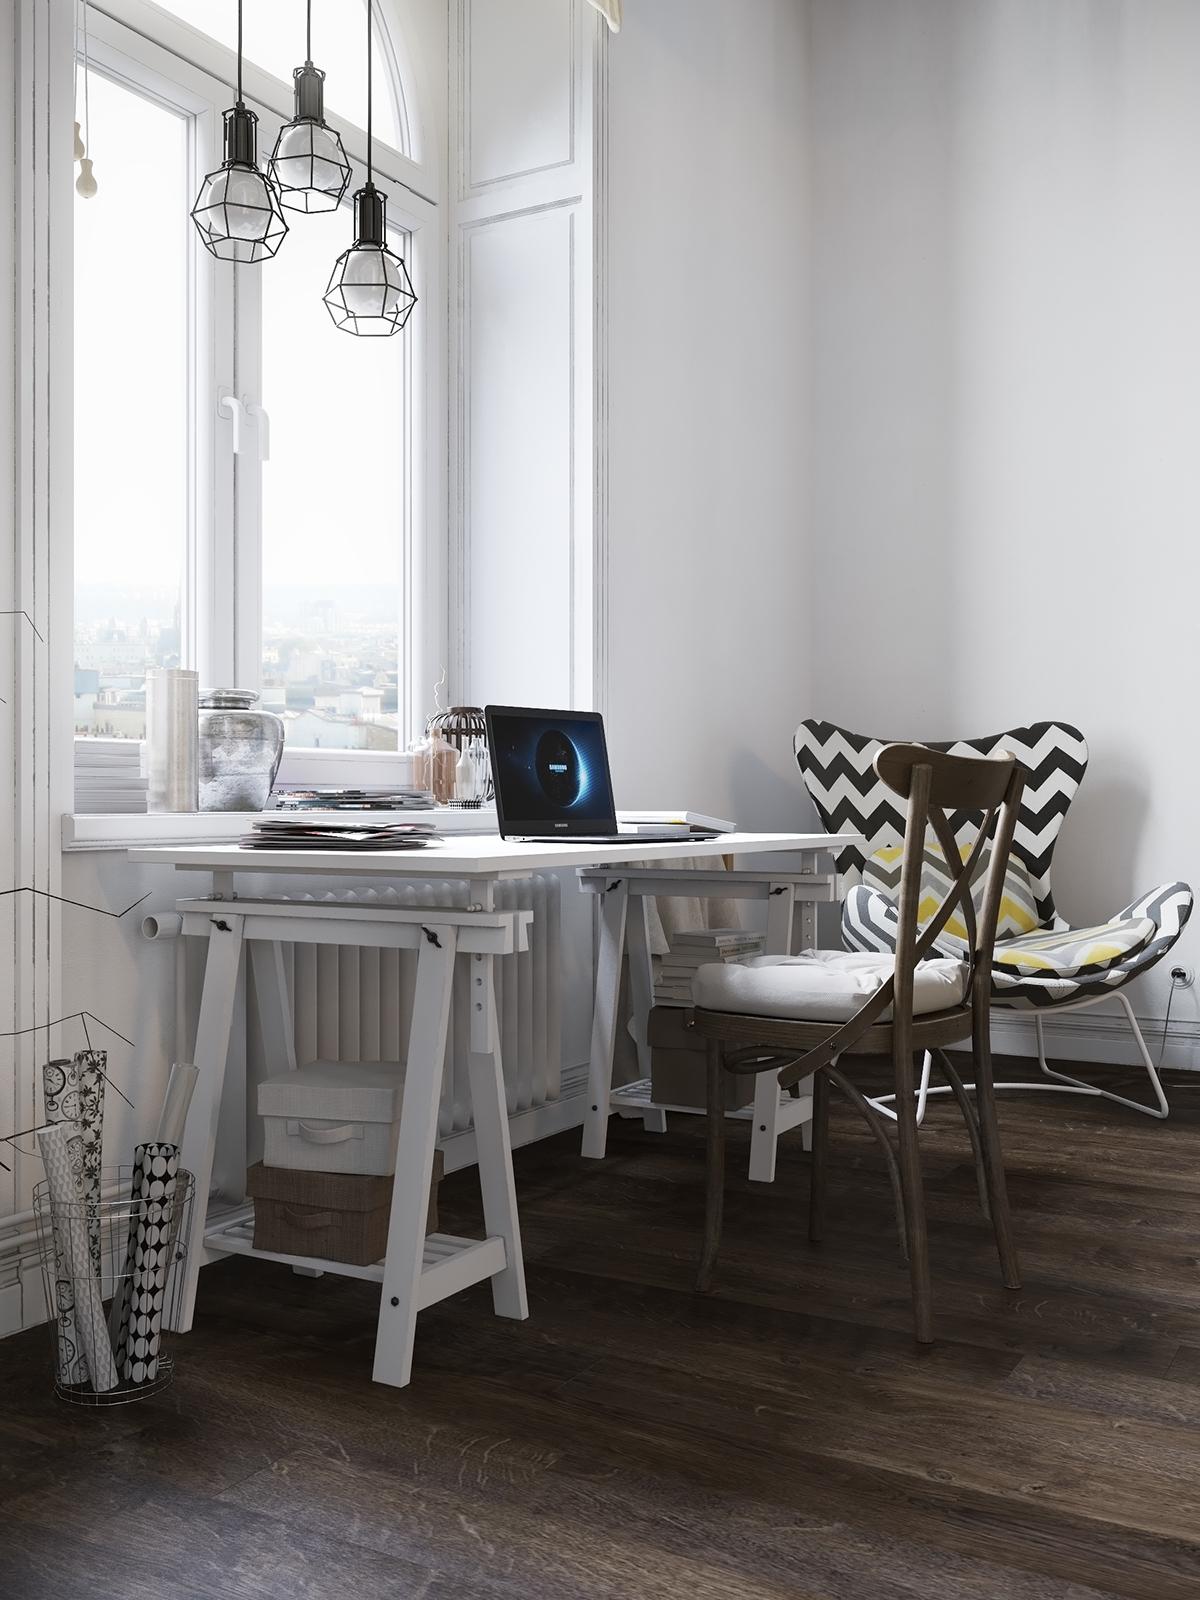 Loft公寓装修书桌设计效果图